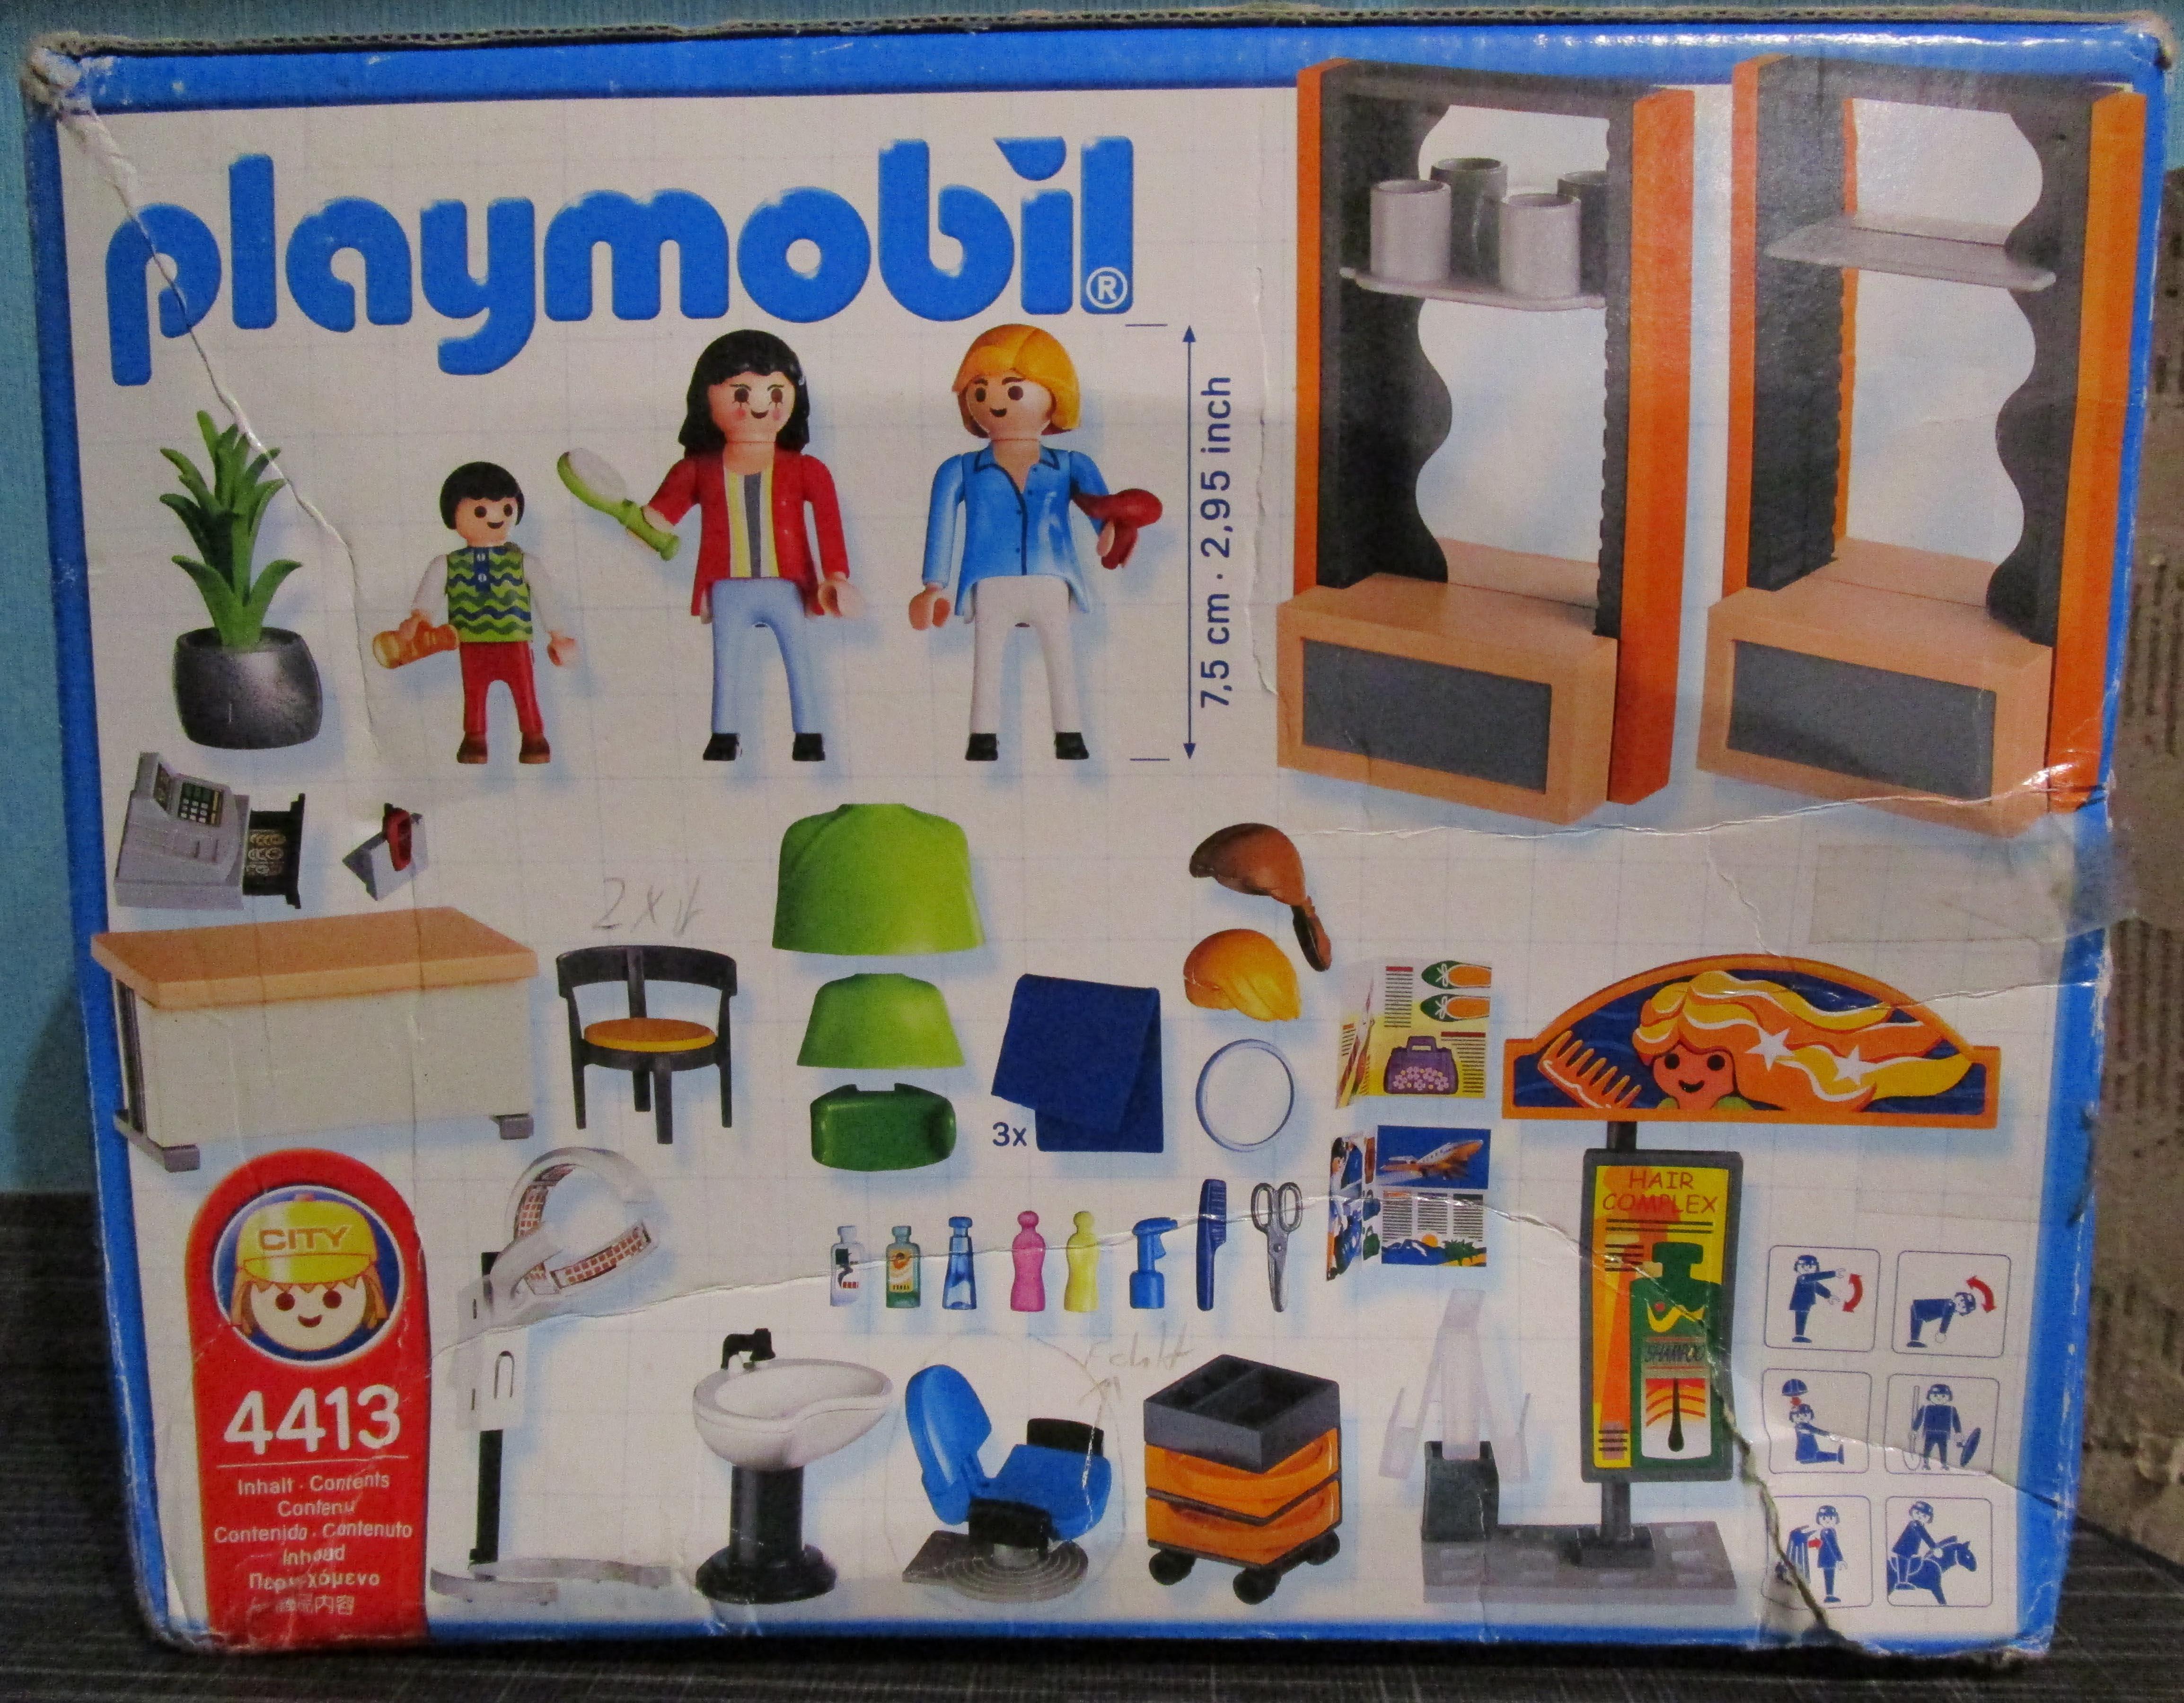 playmobil 4413 Friseursalon Verpackung hinten Playmobil Spielzeug im Vergleich: Friseursalon 4413 vs. Beauty Salon 5487   Rollenspiel Waschen, schneiden, fönen   bitte